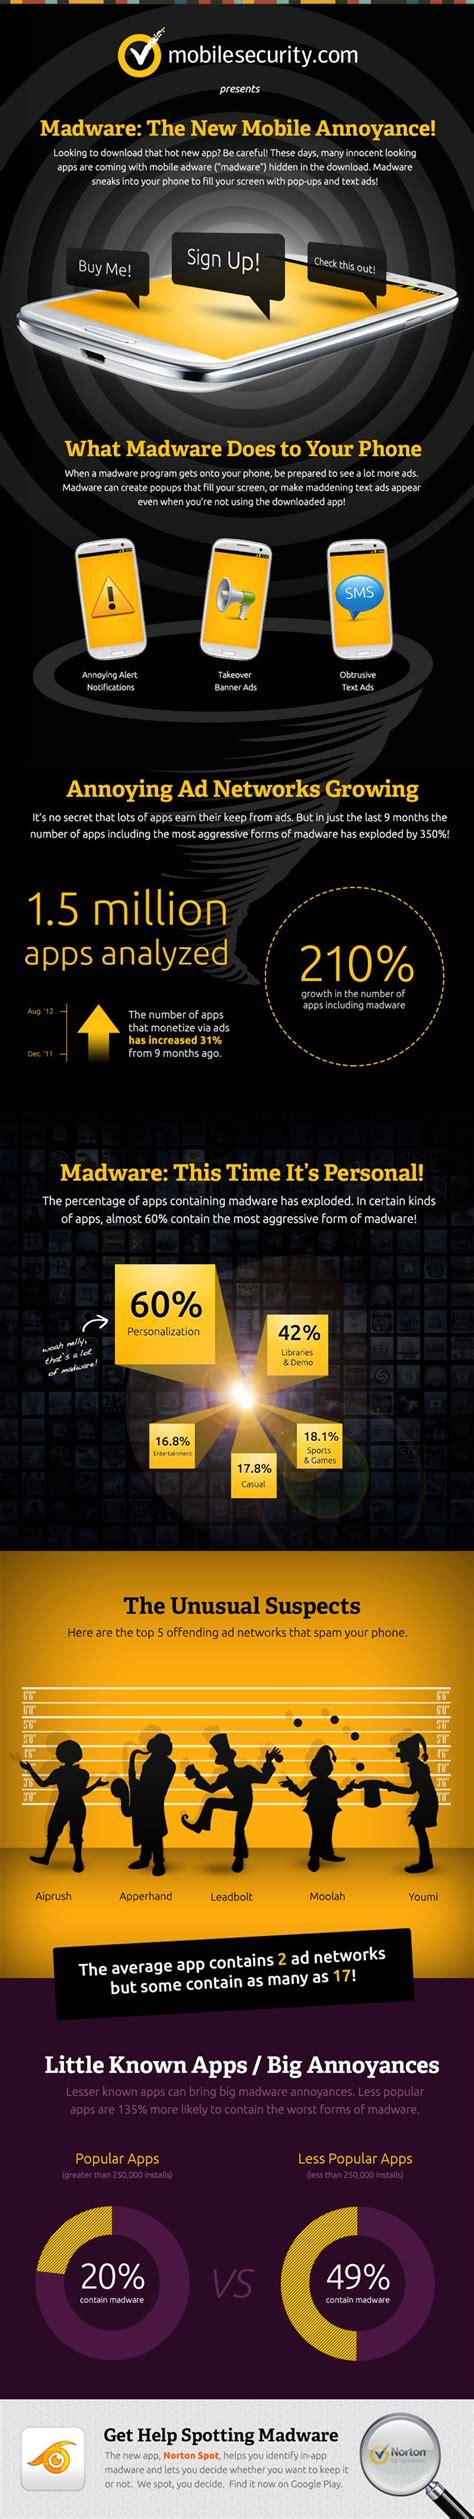 best security 2015 norton security 2015 review best antivirus free